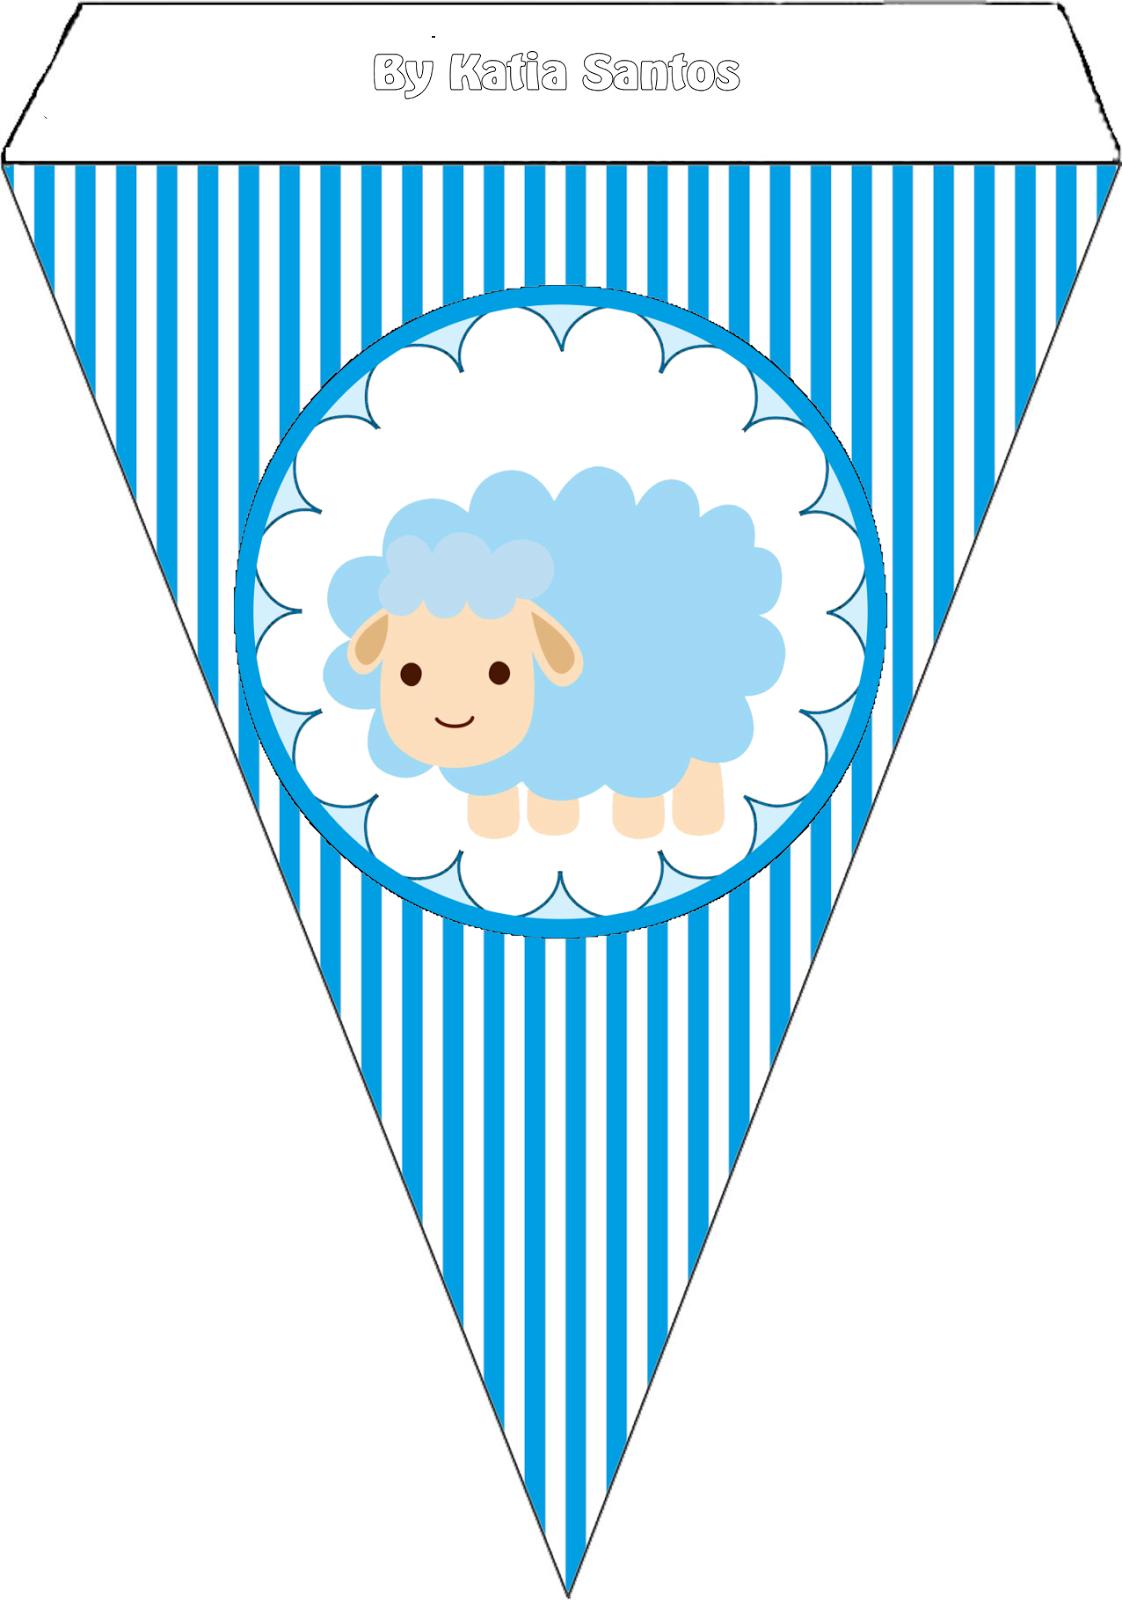 Banderines para Imprimir Gratis de Ovejita para Niño.